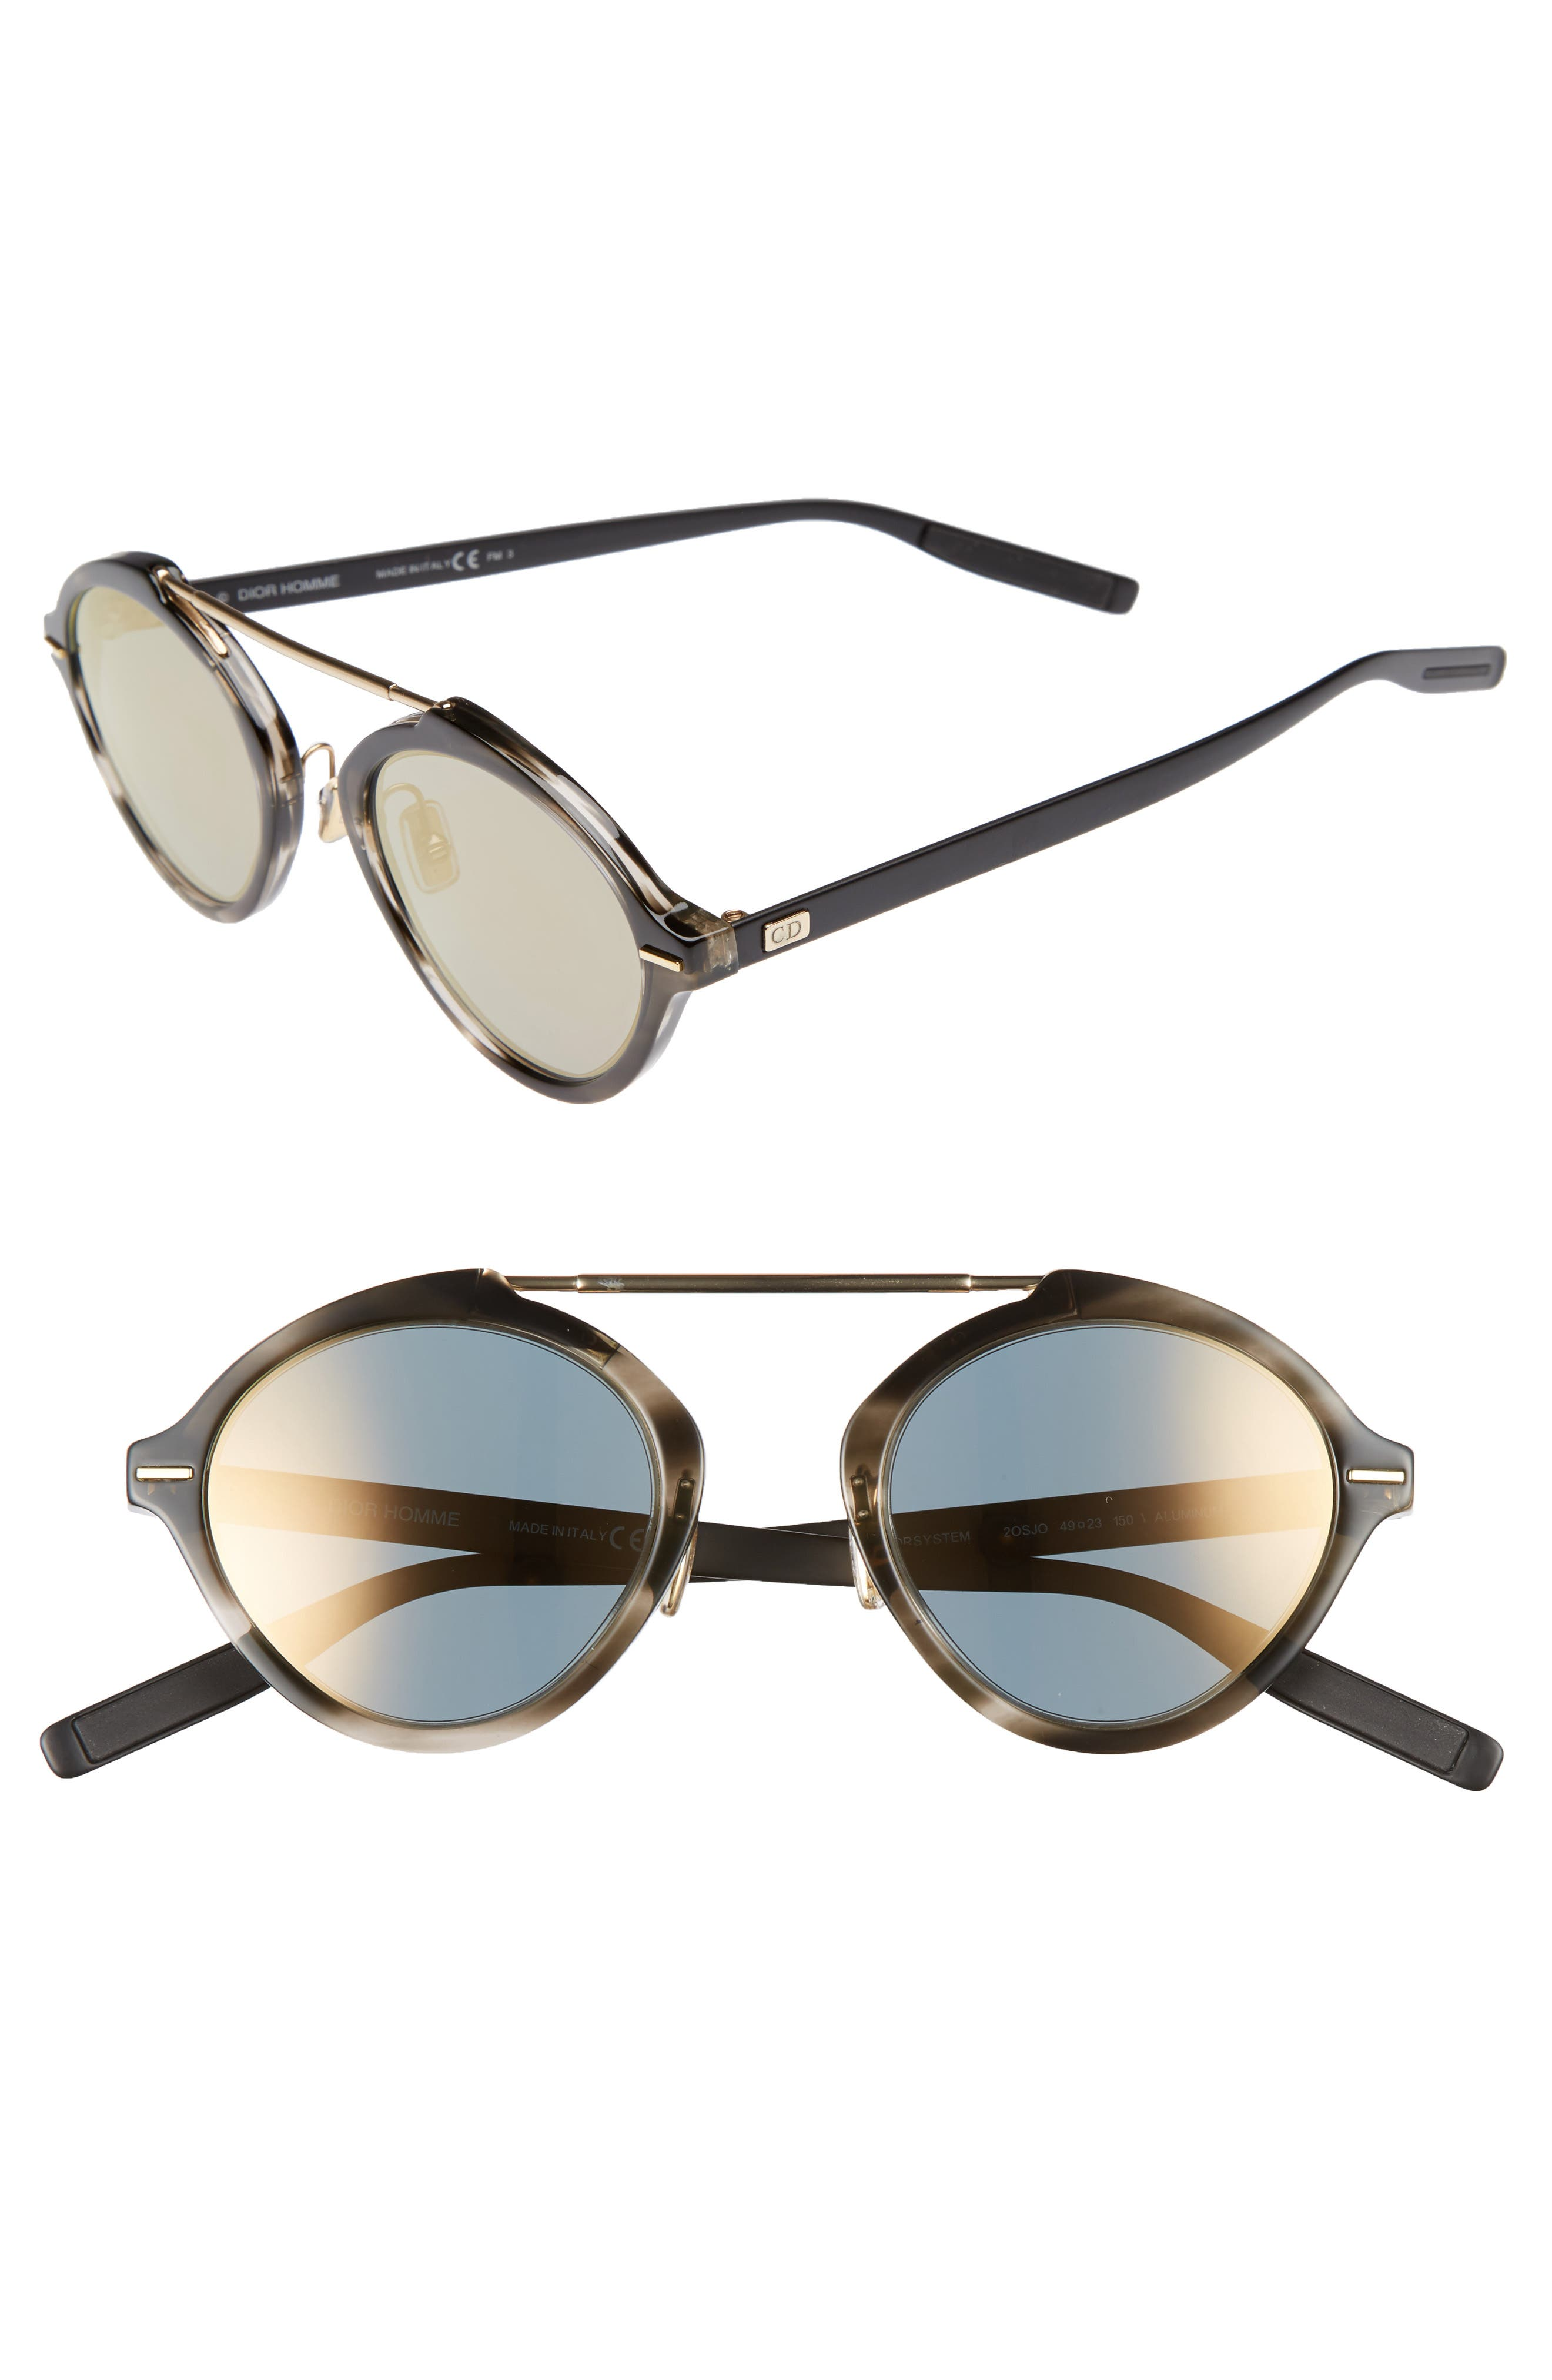 System 49mm Sunglasses,                             Main thumbnail 1, color,                             HAVANA MATTER BLACK/ GREY